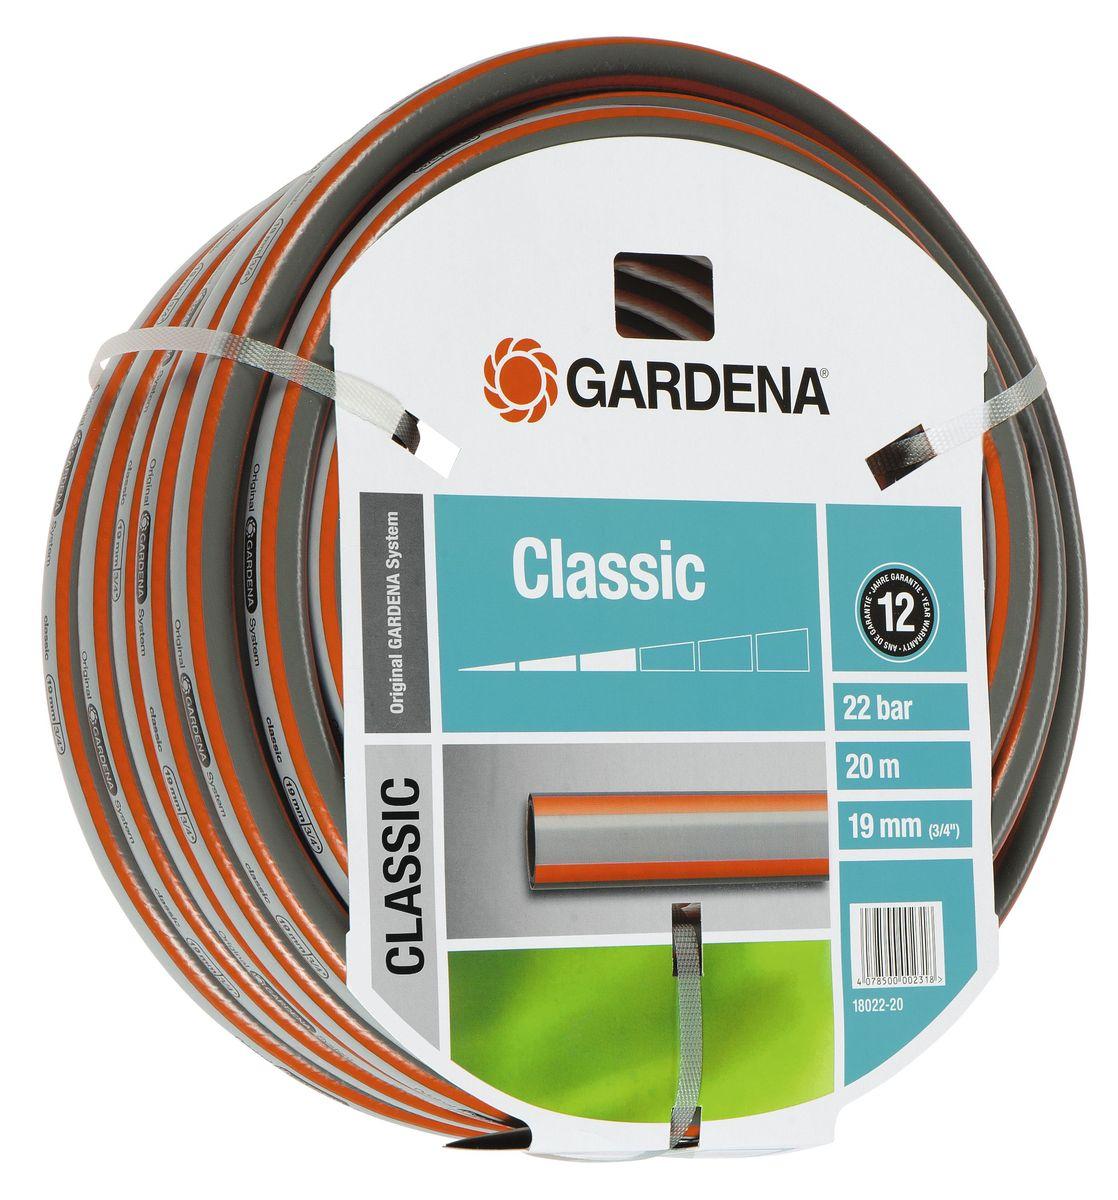 Шланг Gardena Classic, 19 мм (3/4) х 20 м шланг подающий gardena 3 16 4 6мм 50м 01348 20 000 00